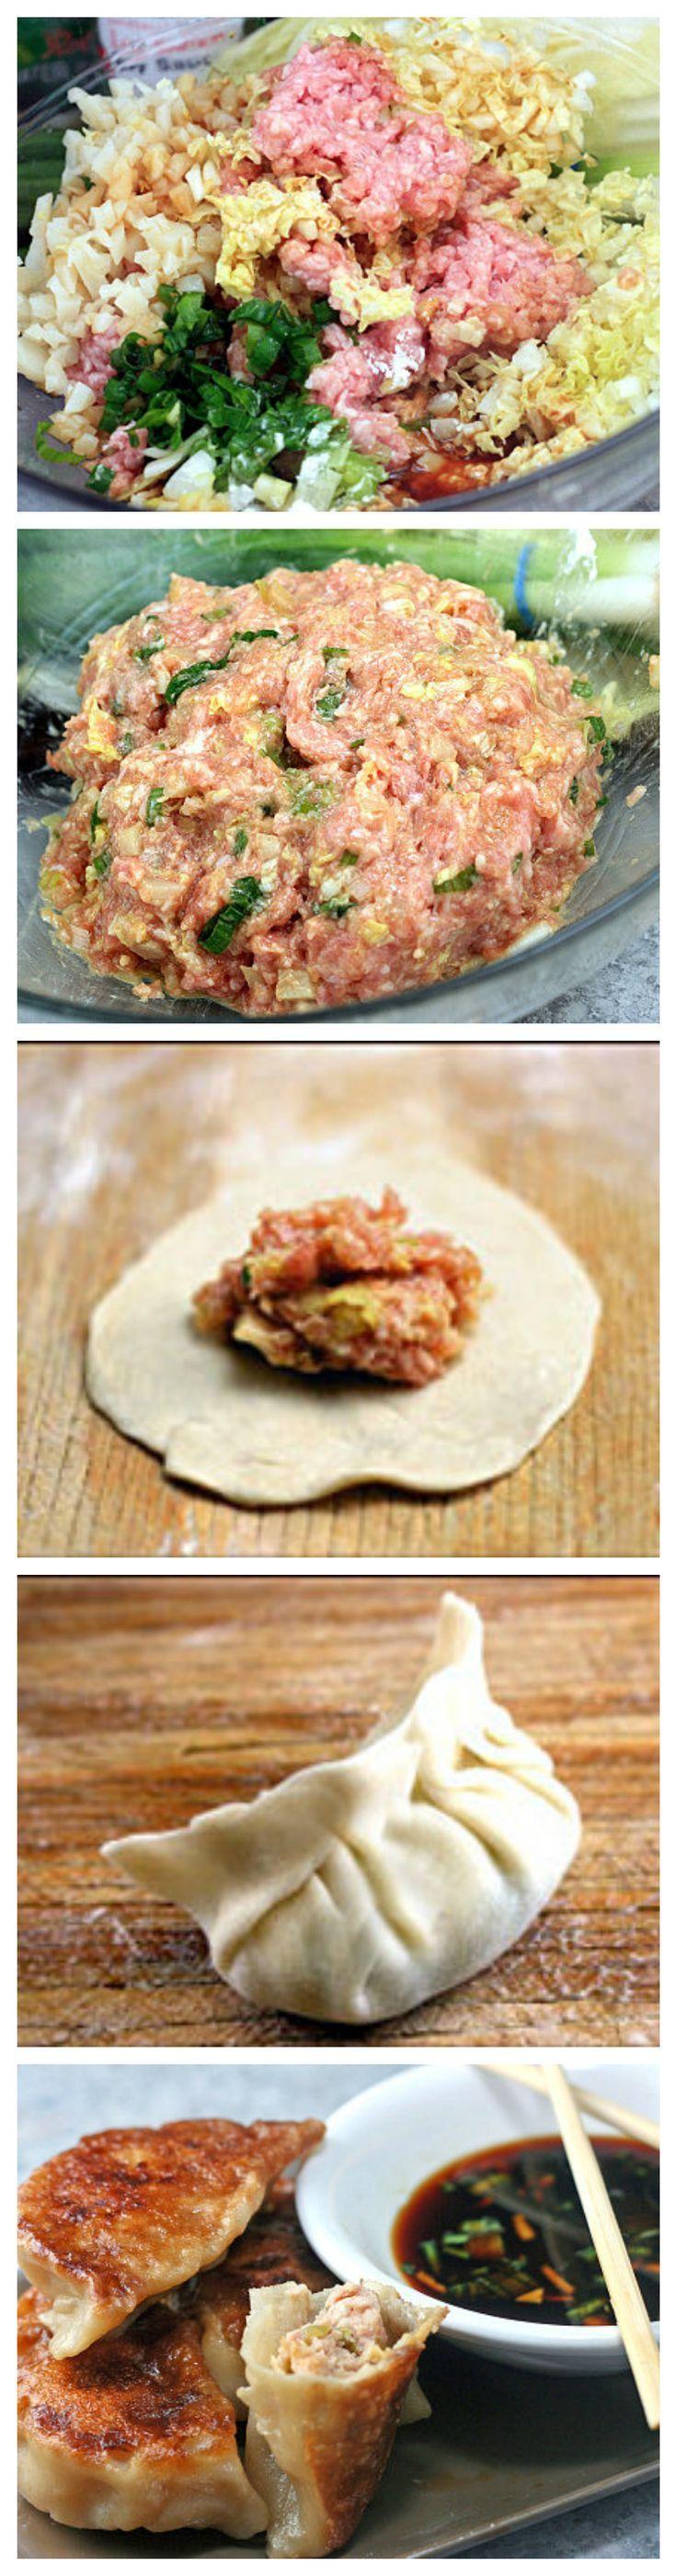 Homemade Dumplings and Potstickers Recipe